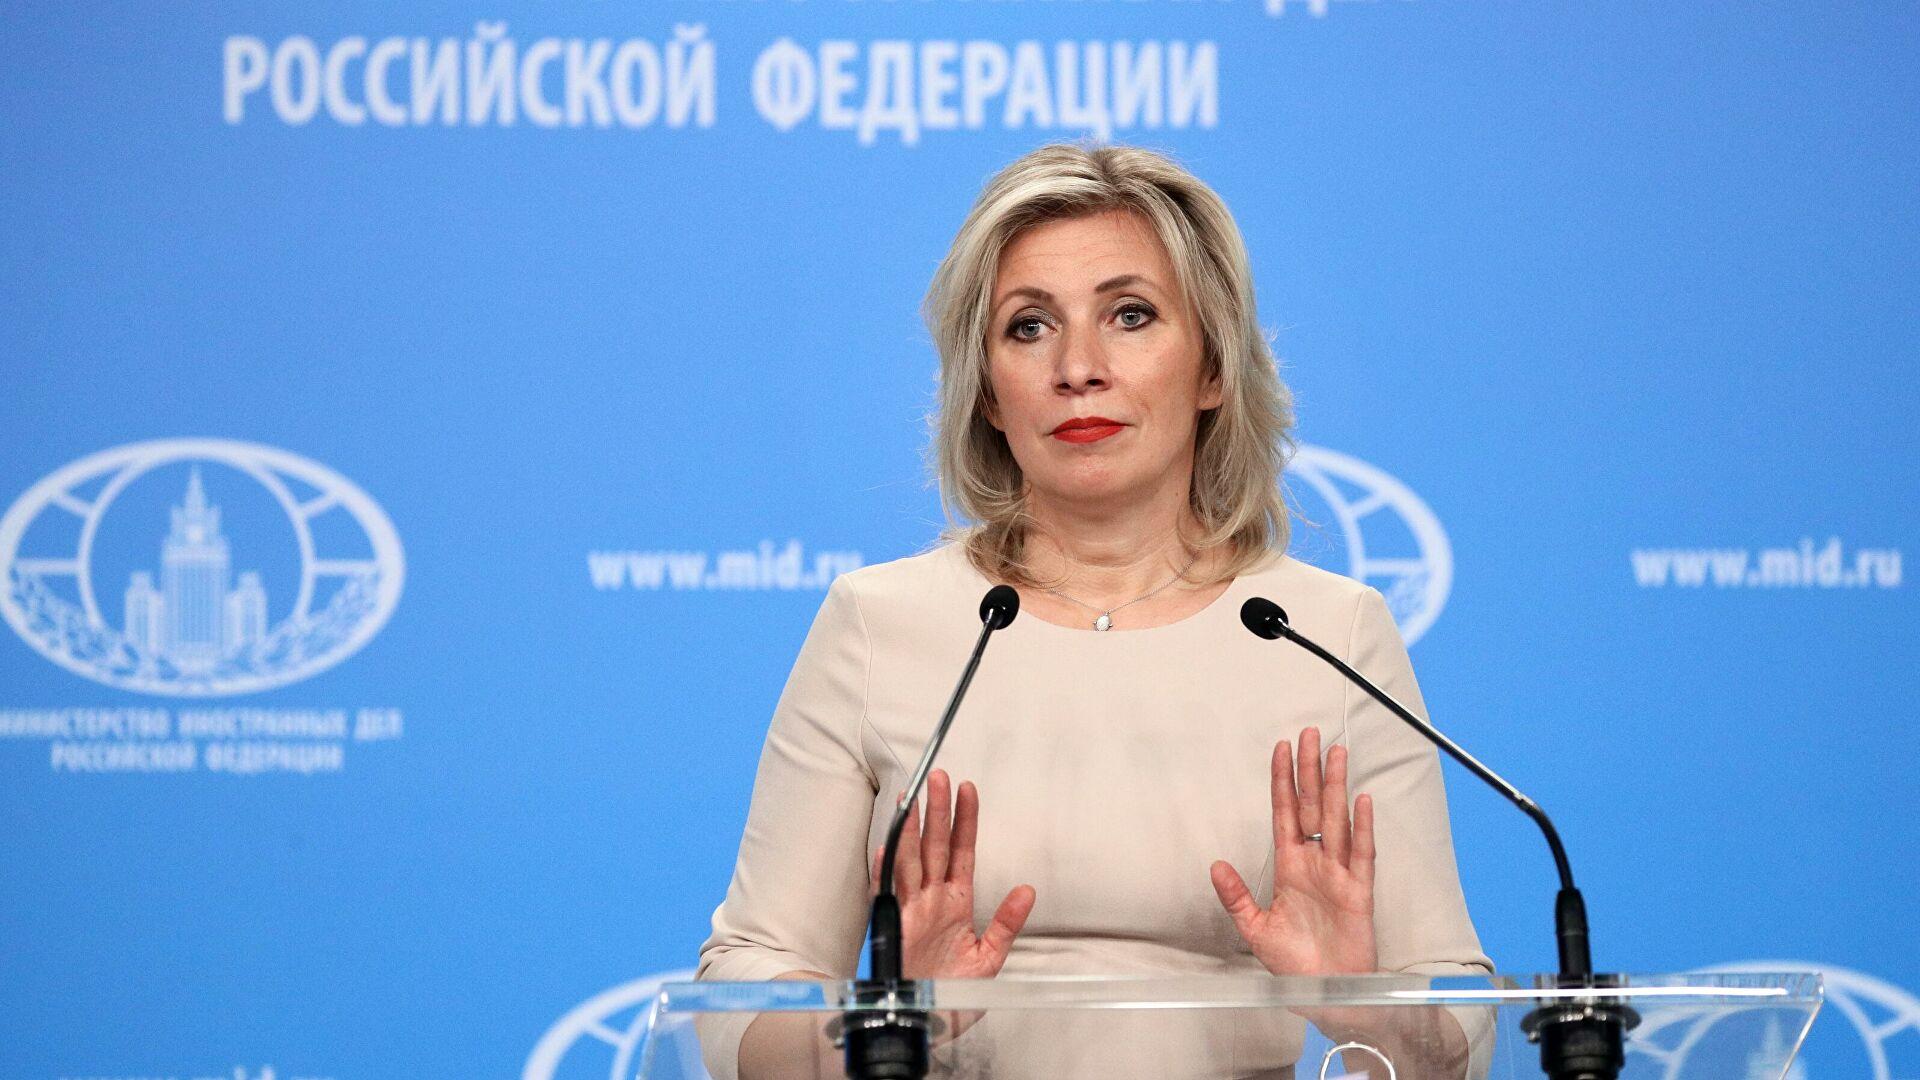 Захарова рассказала о методах борьбы с фейк-ньюс